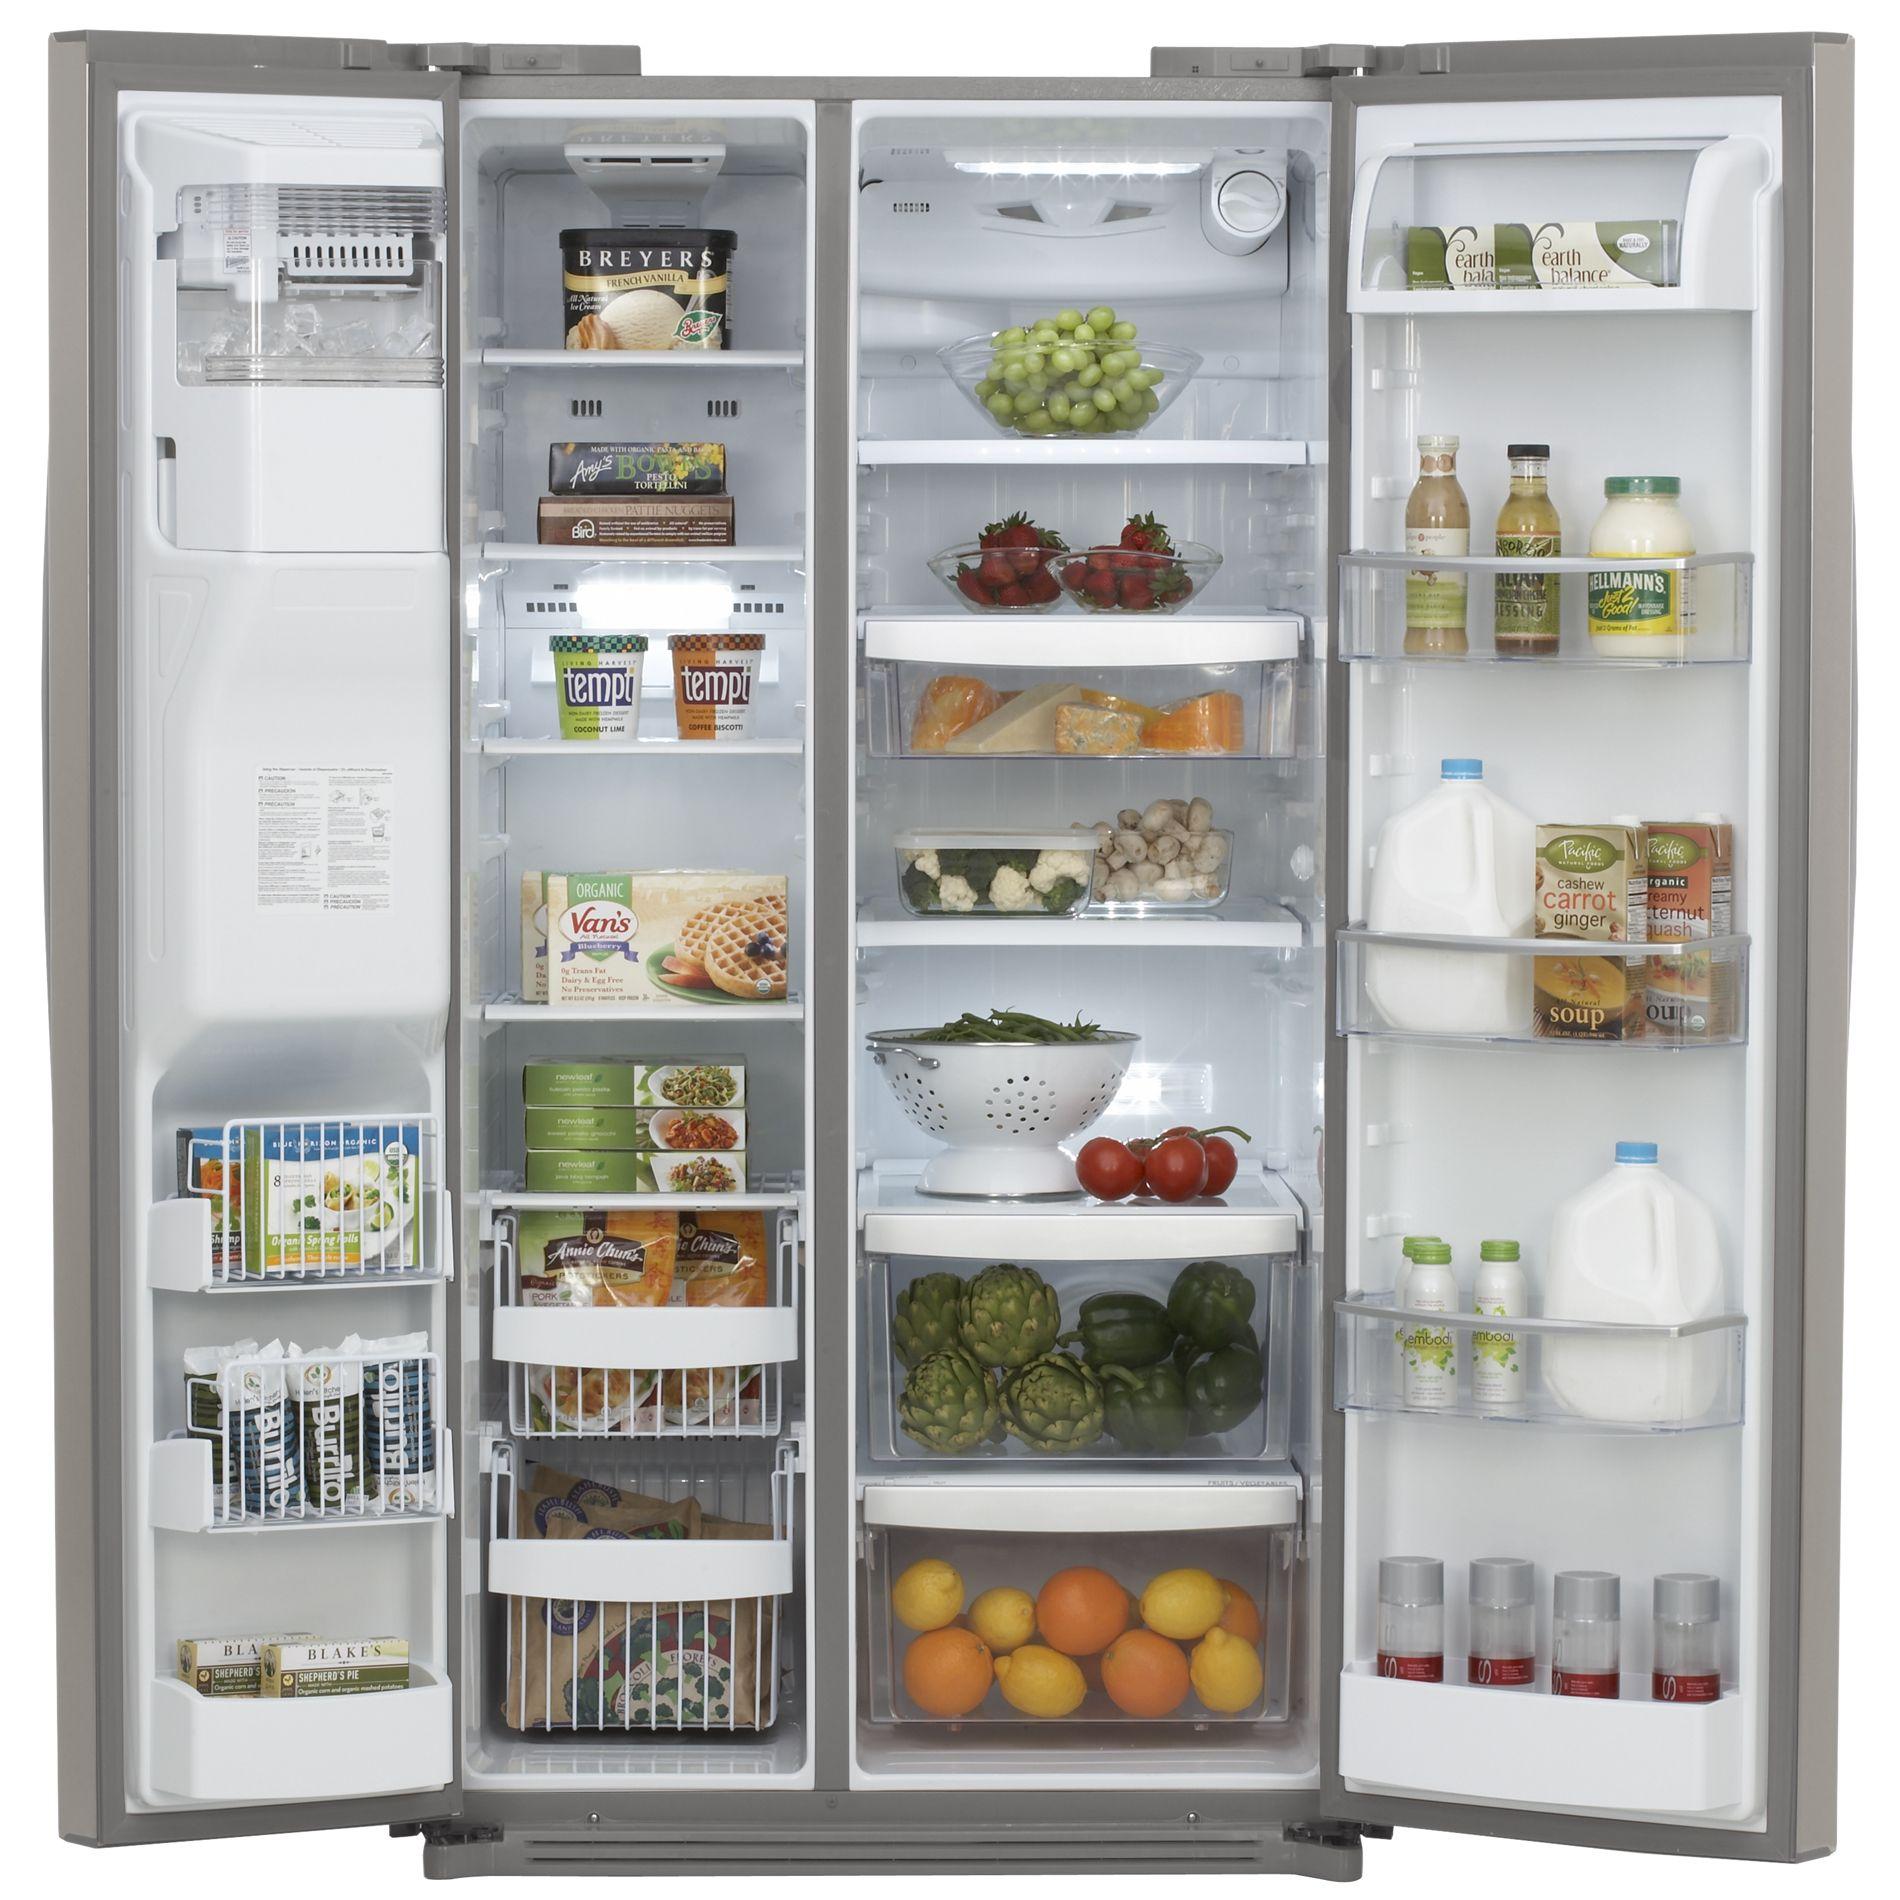 Kenmore Elite 26.5 cu. ft. Side-by-Side Refrigerator (5108)